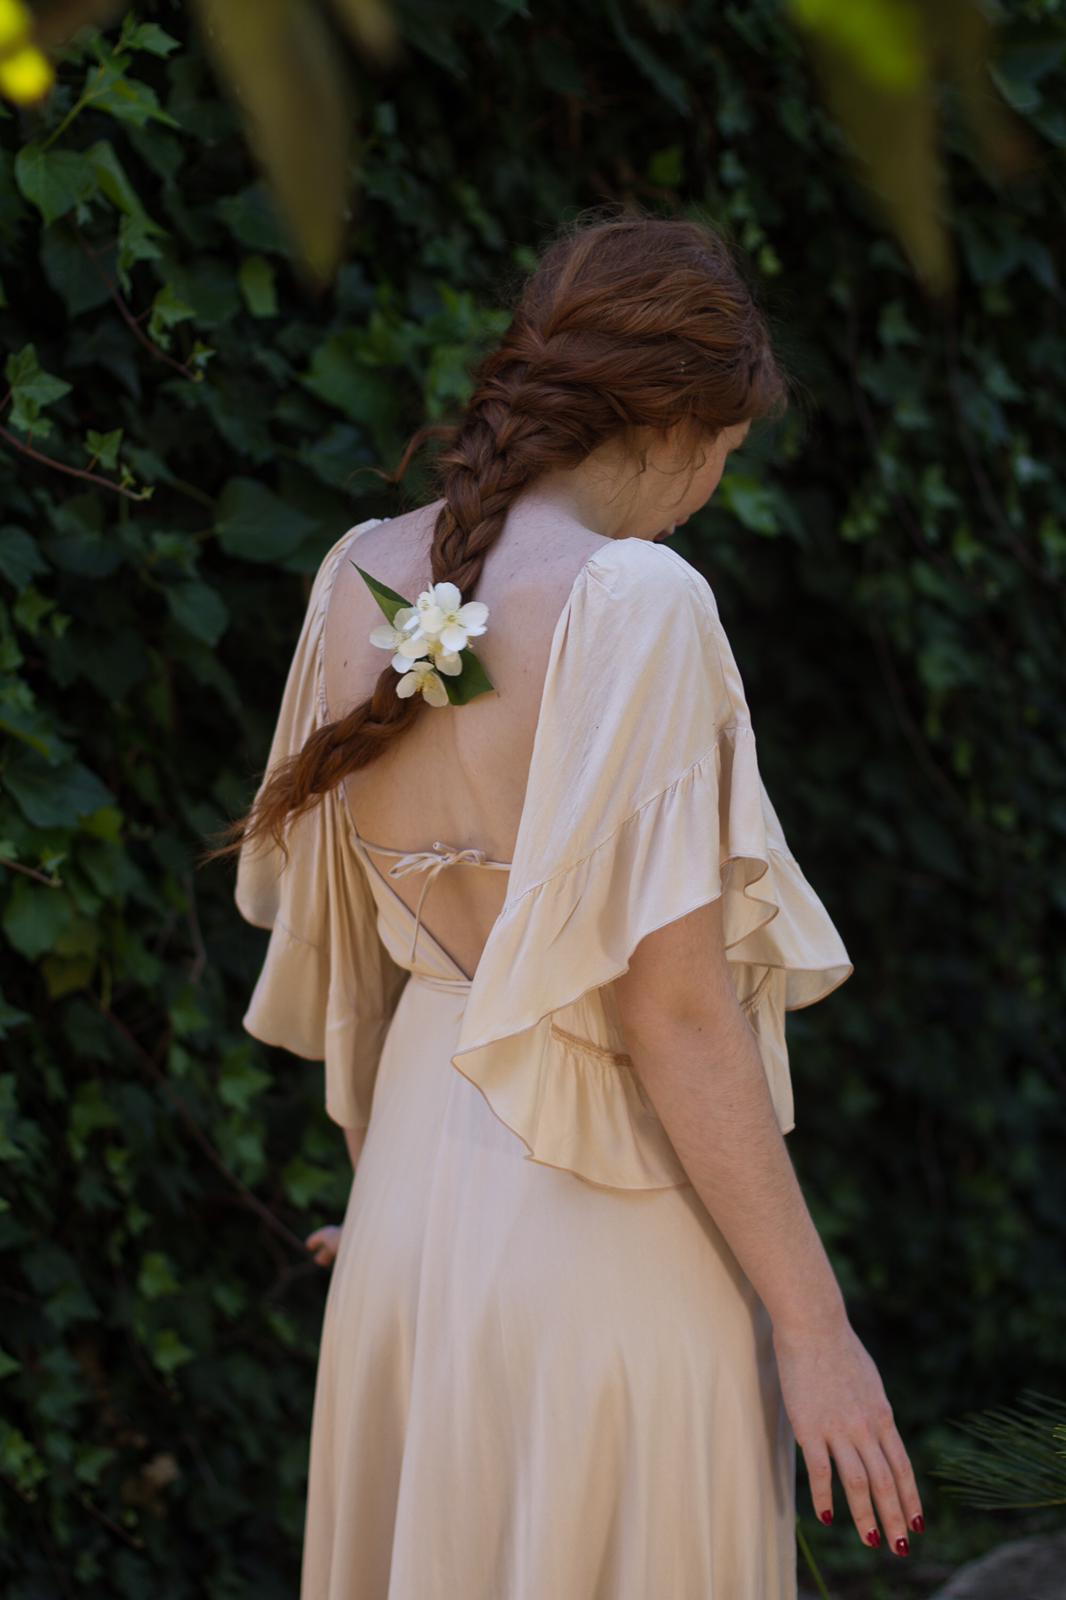 carolina.albertoni.mallorca.handmade.dresses.soft.sensual.feminity.designer.elegant